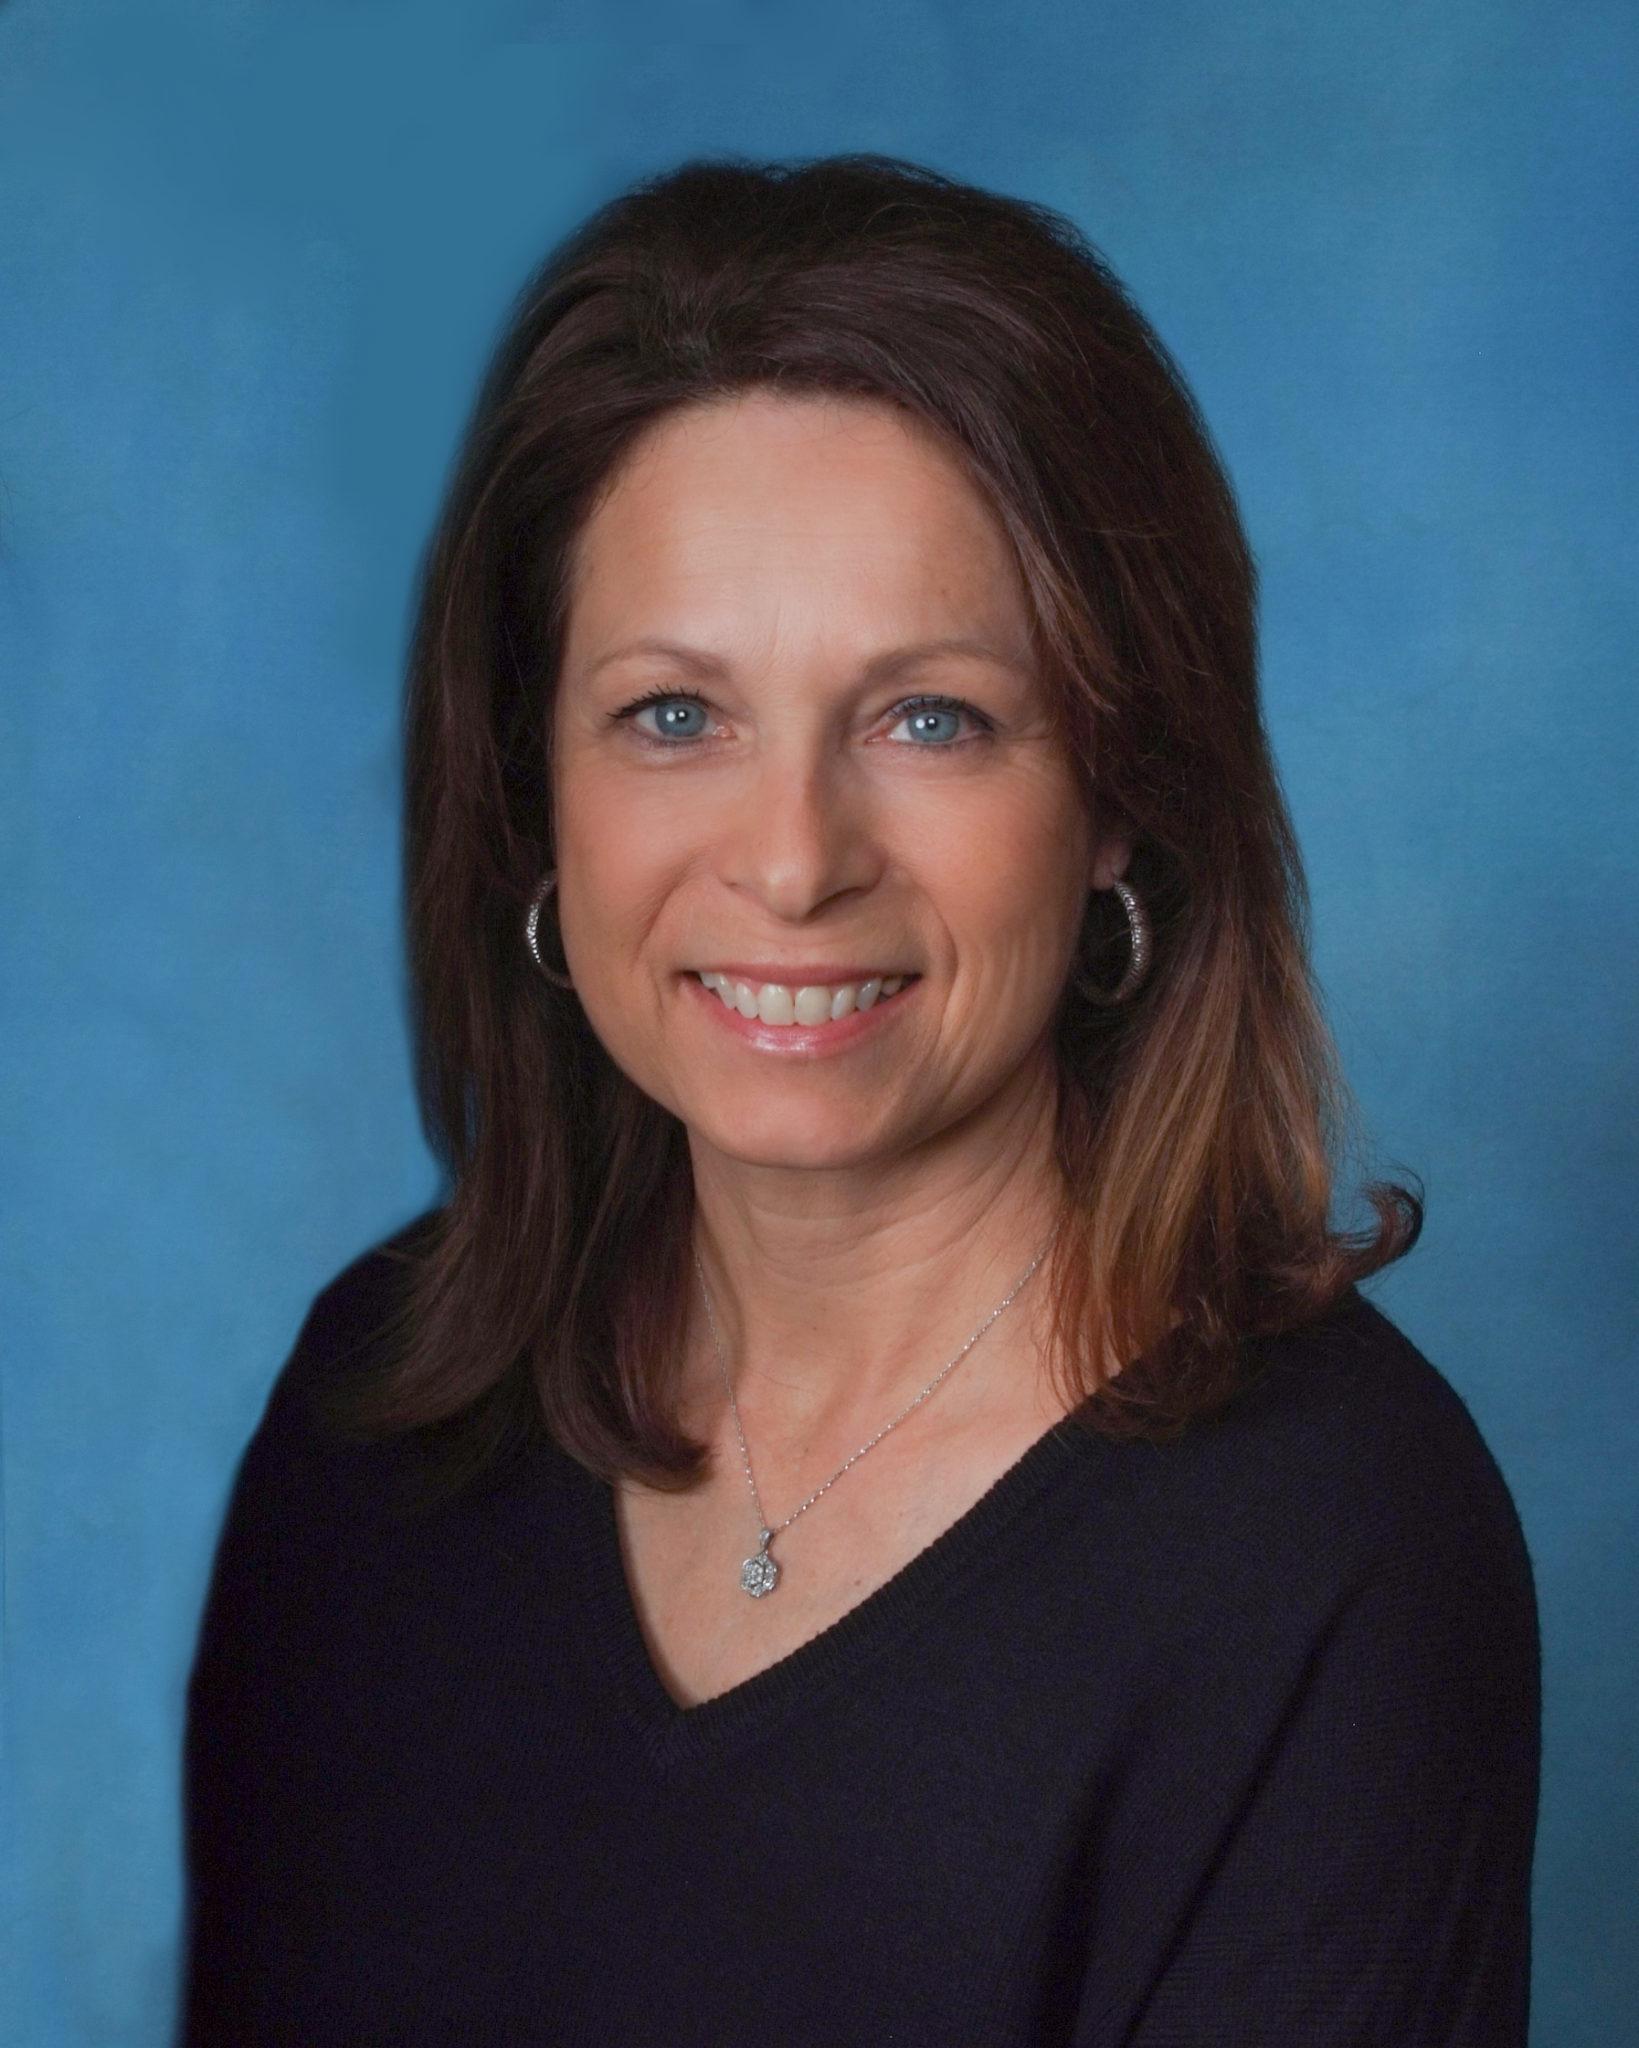 Sheila Woldenberg